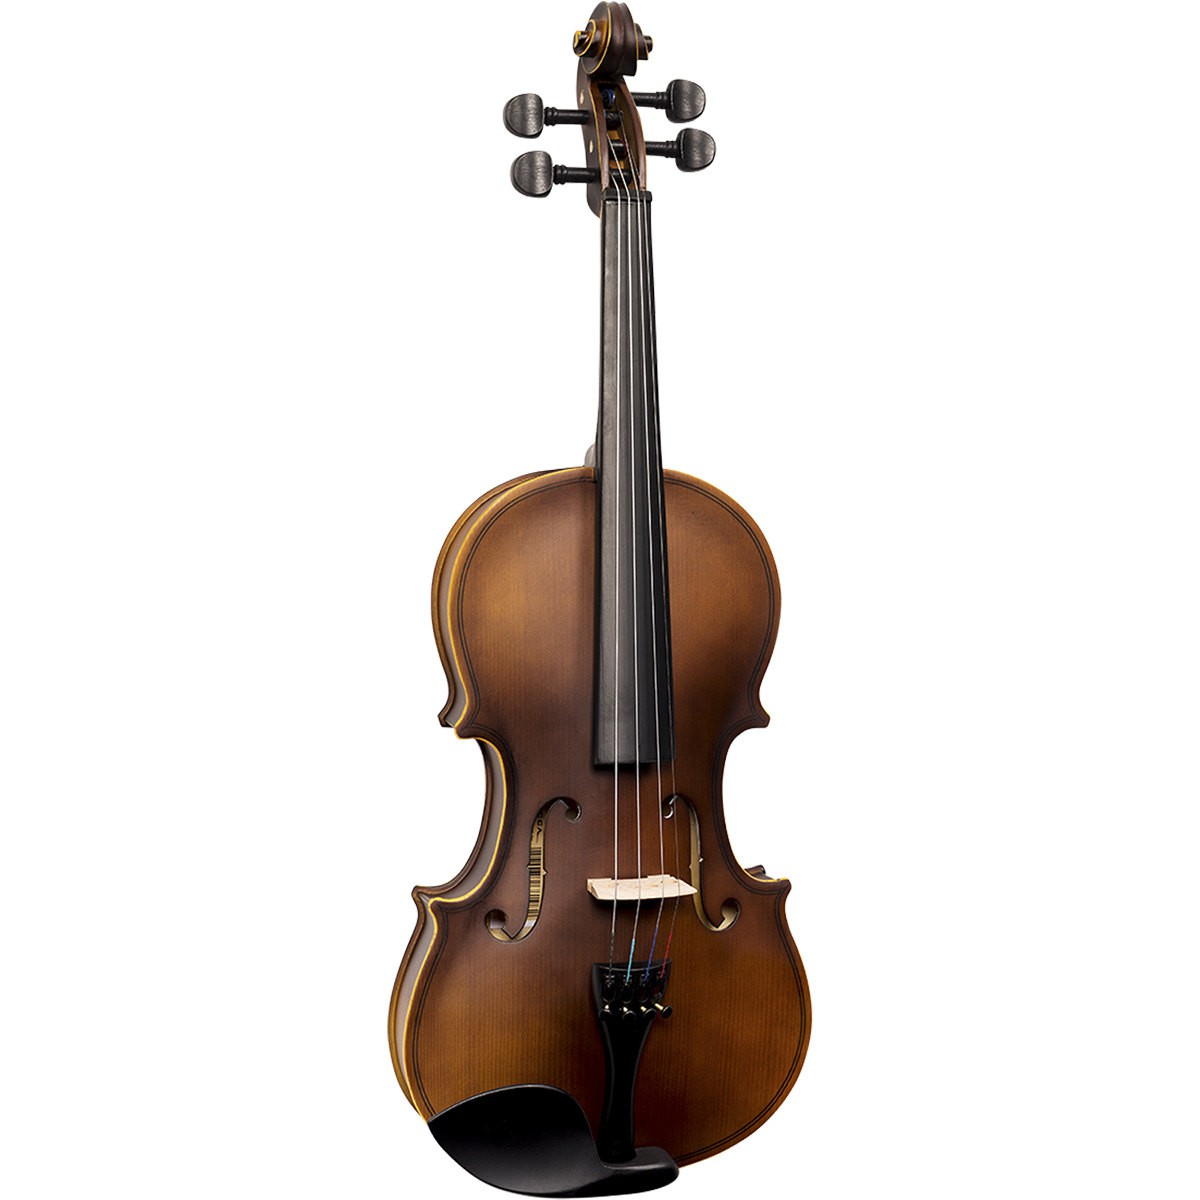 Violino Vogga VON-134 3/4 Natural